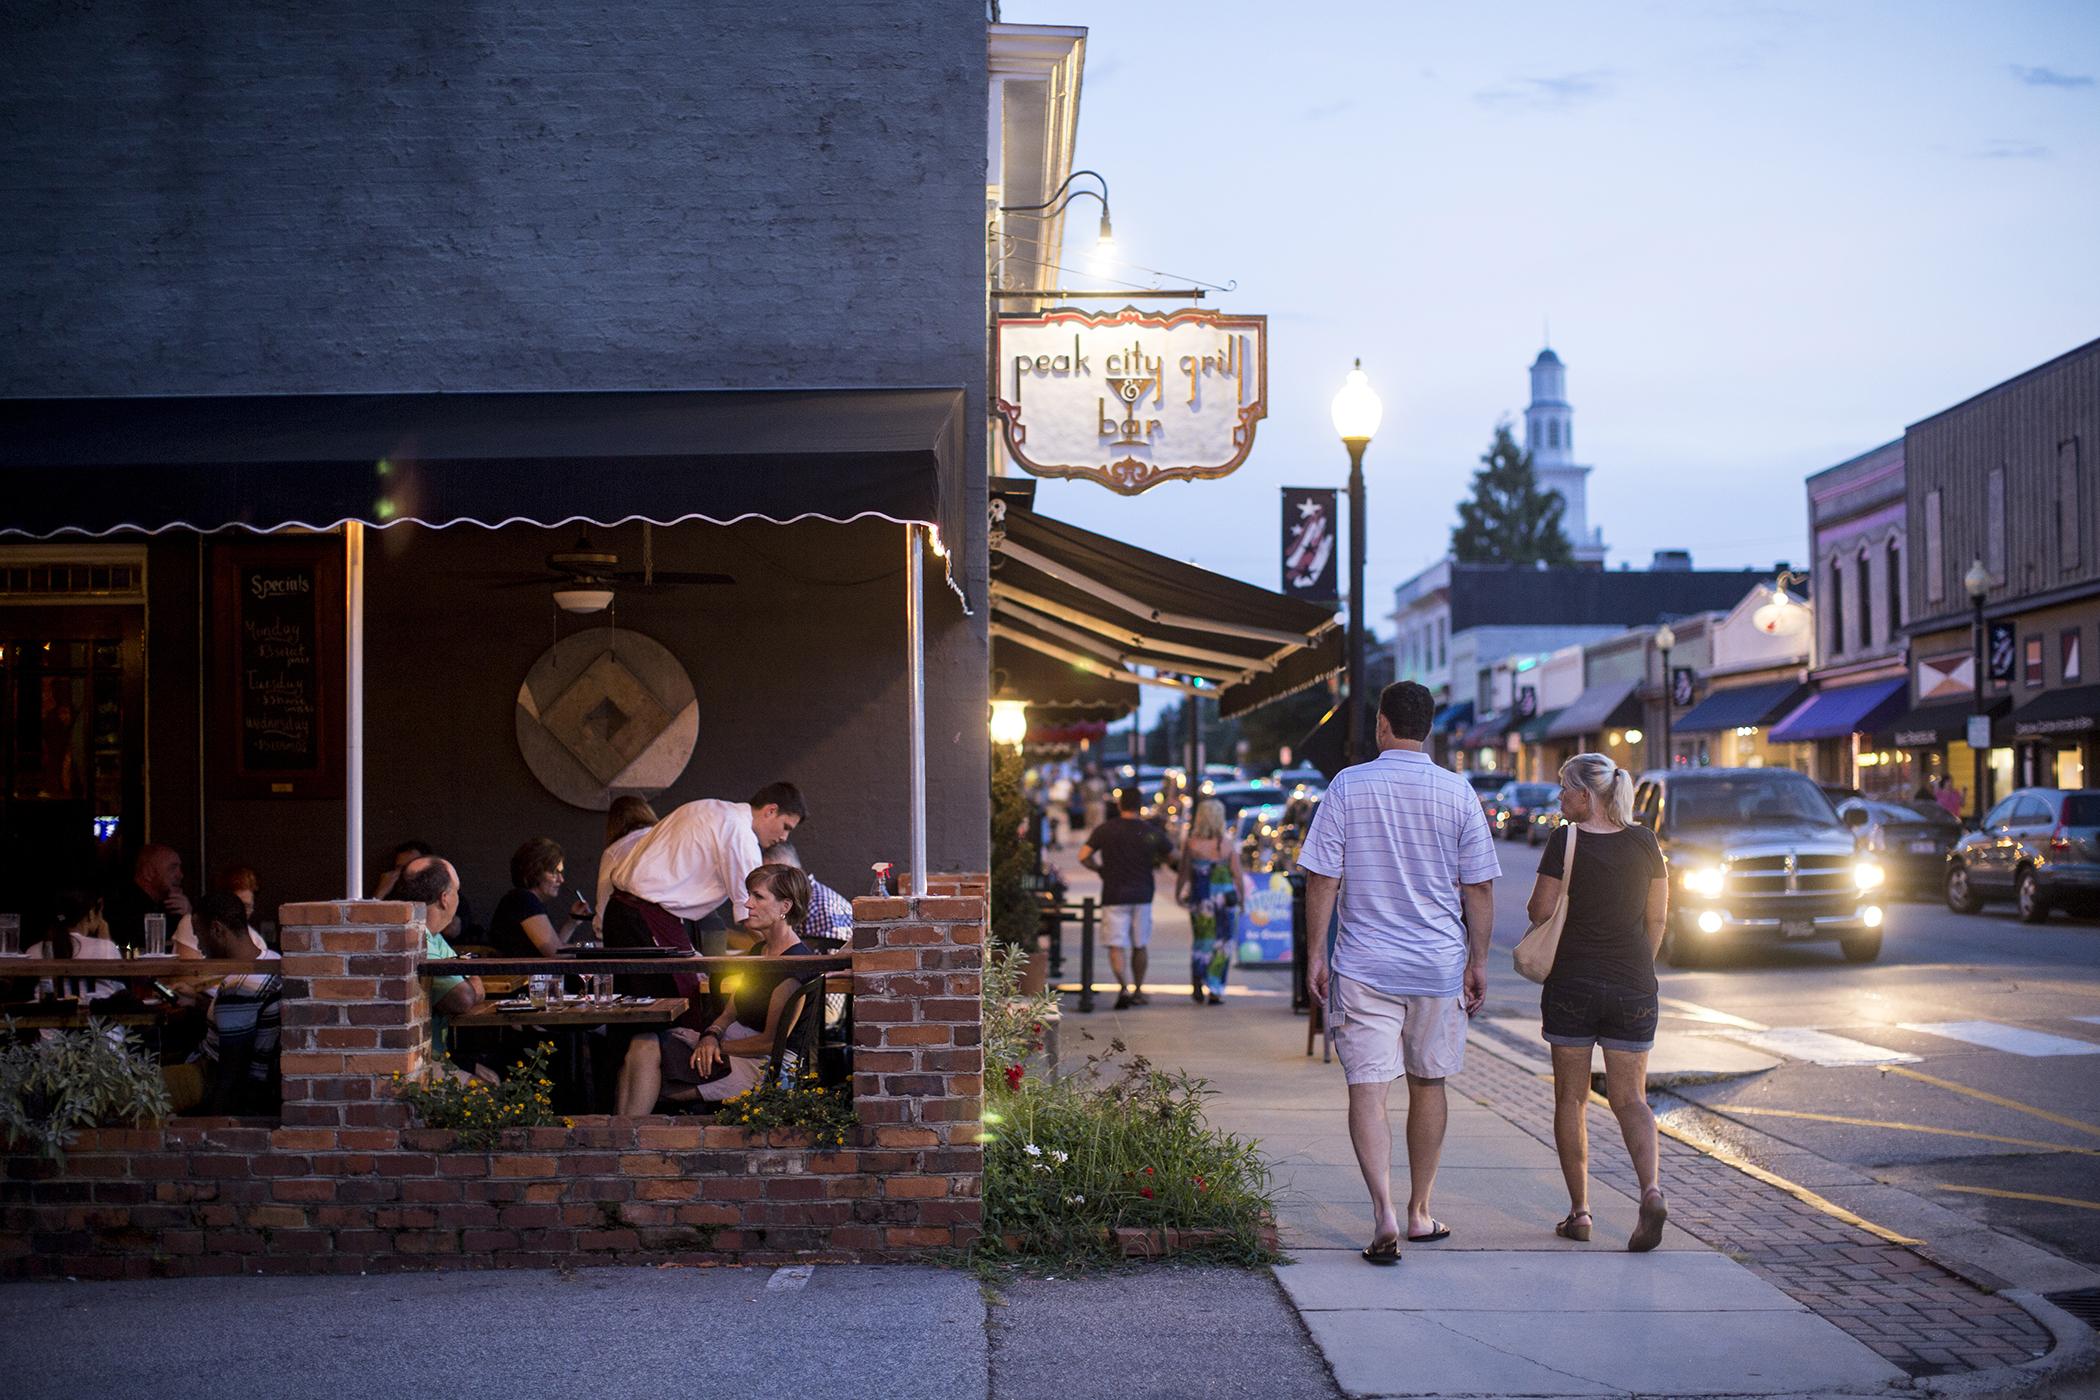 Visitors enjoy a nice evening along Salem Street in downtown Apex, NC